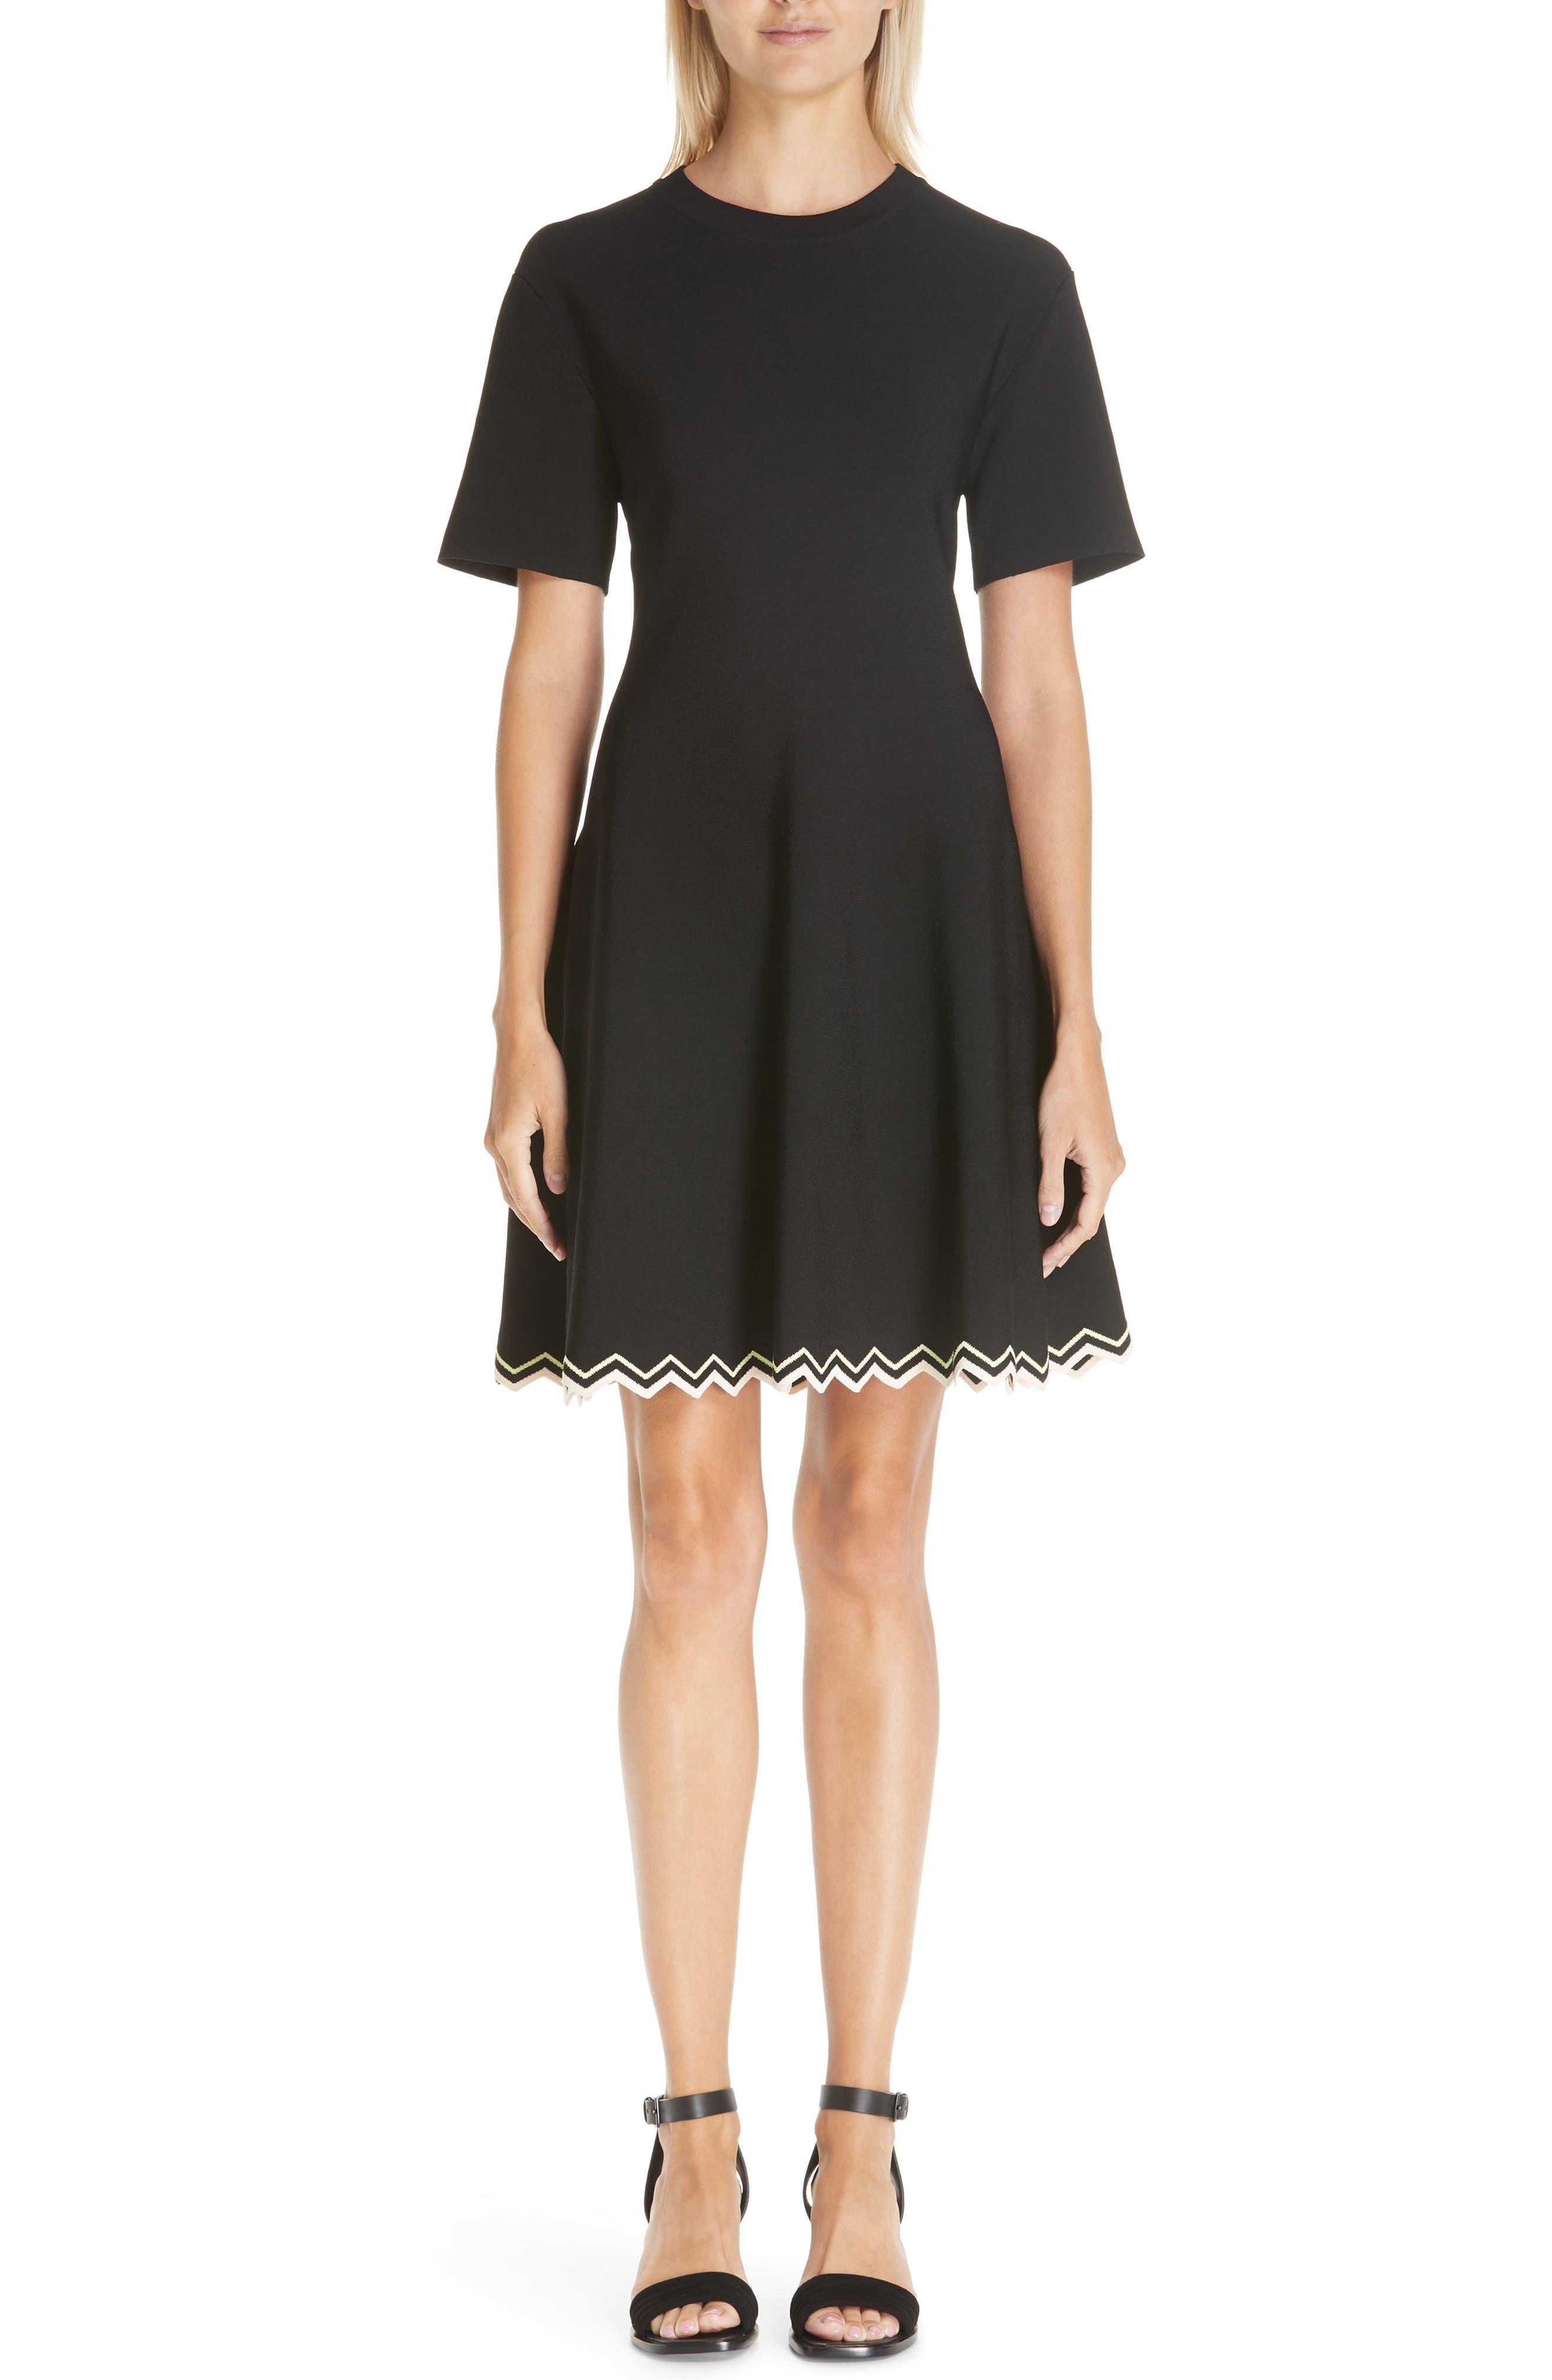 Proenza Schouler Chevron Hem A-Line Dress, Black